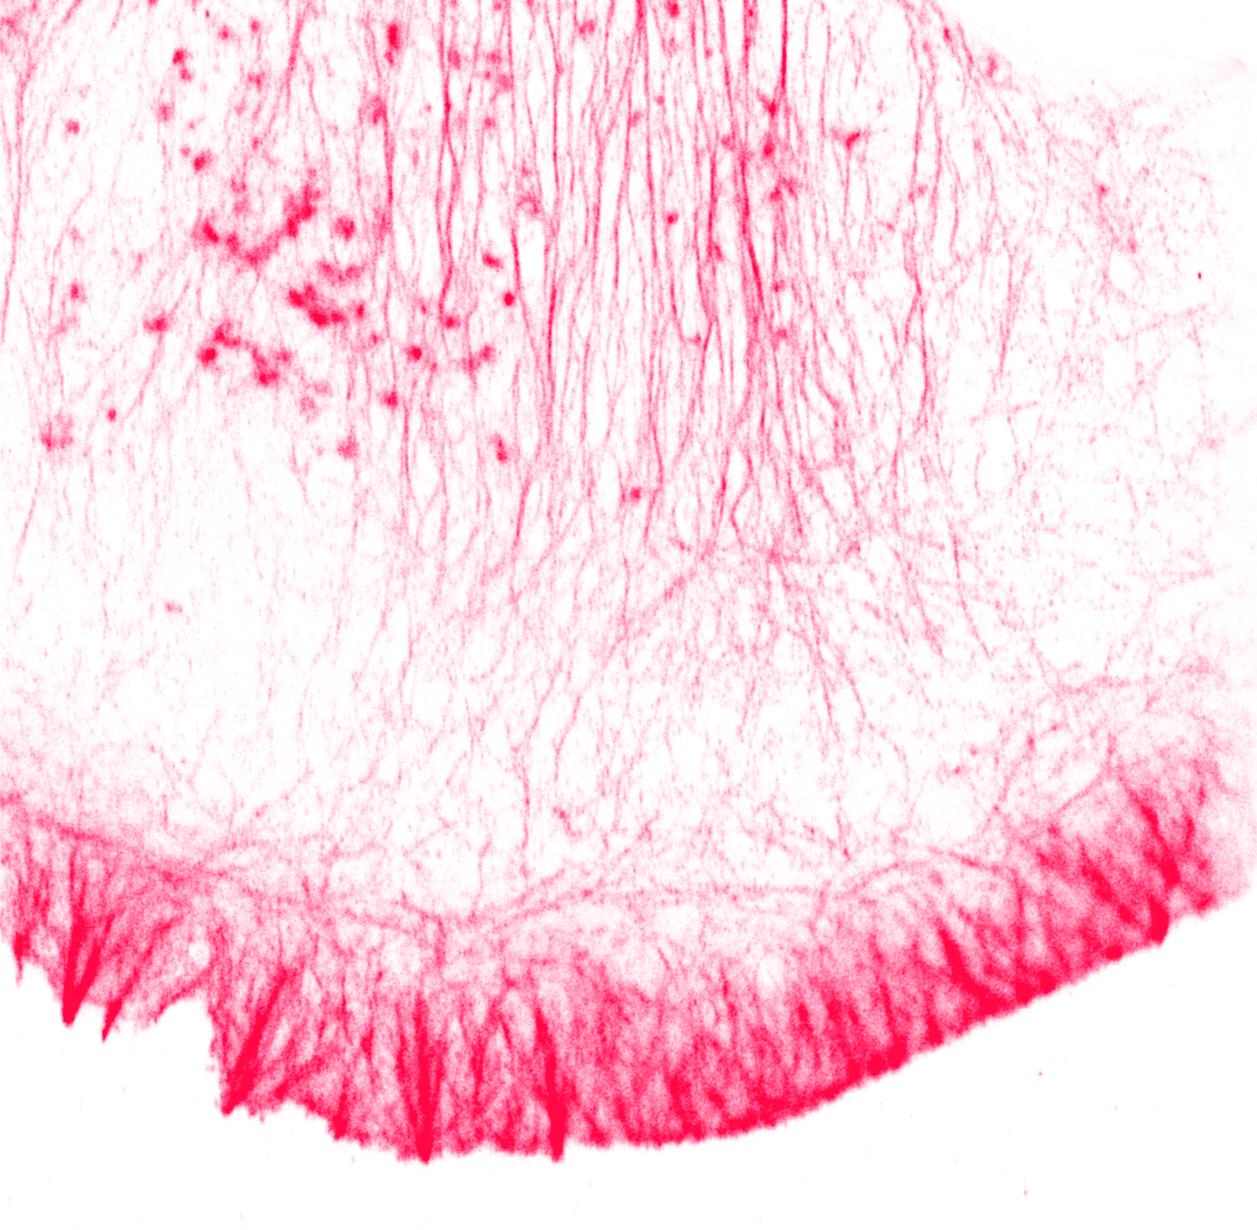 actincelli